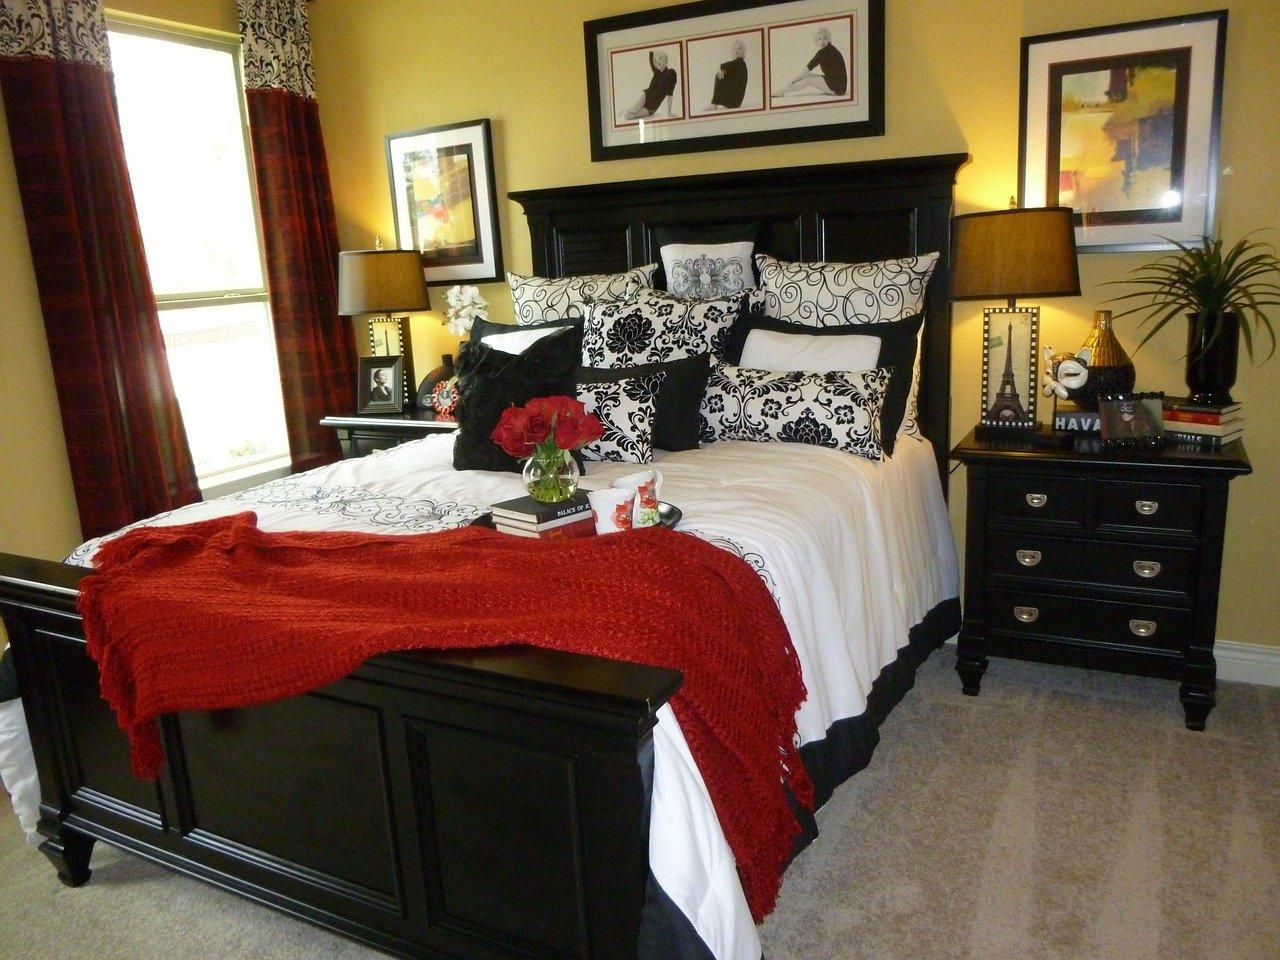 Bedroom Decor Ideas | http://bankstatementpdfedit.com/